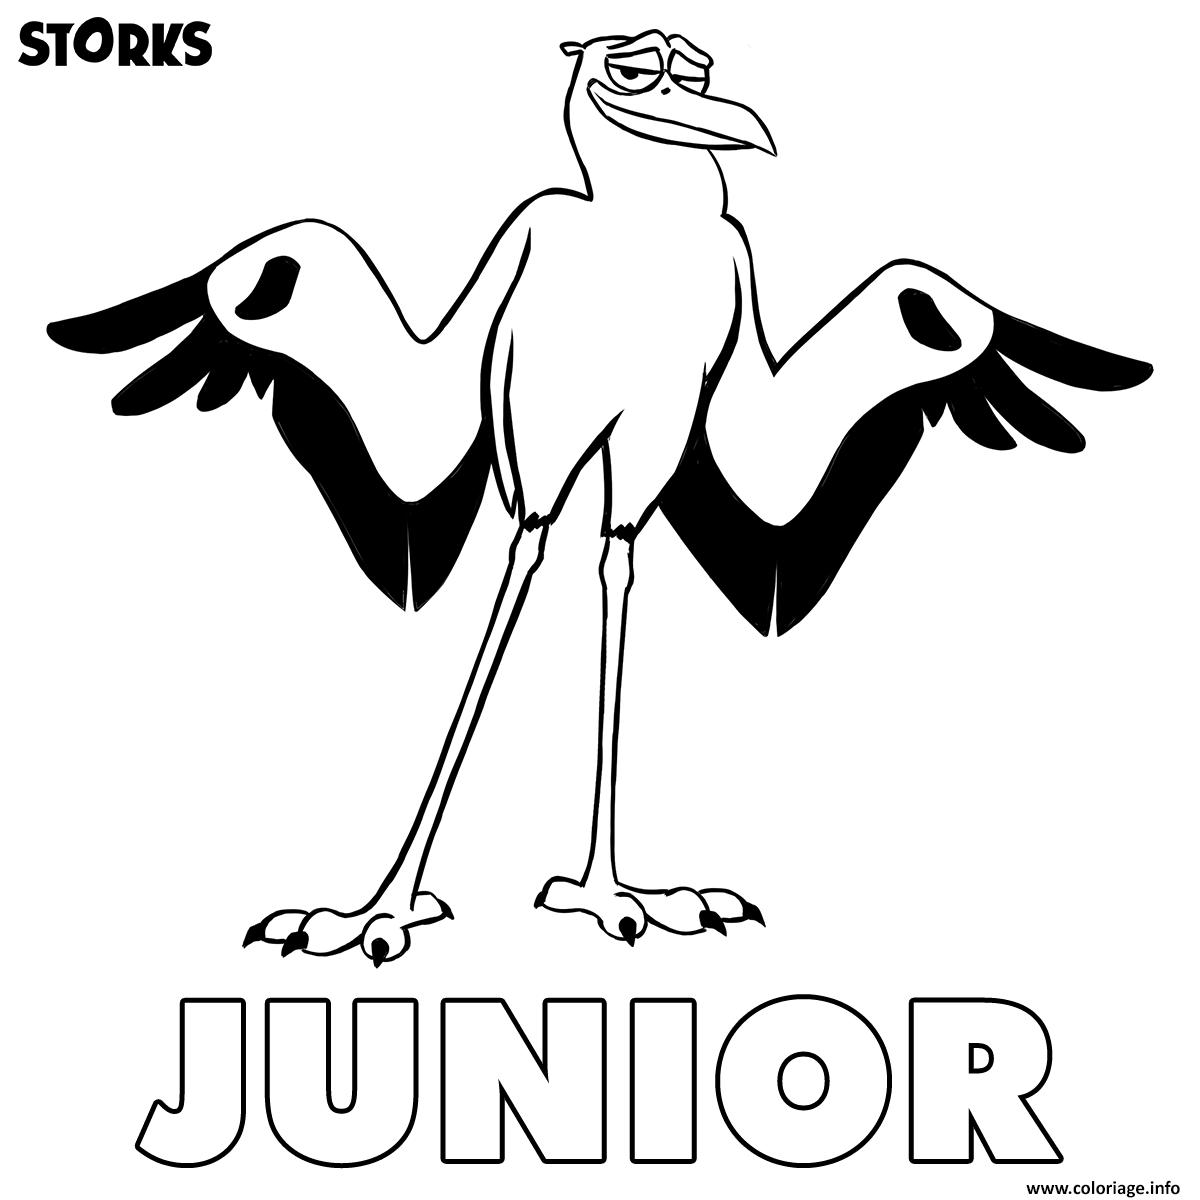 Coloriage cigognes et compagnie junior dessin - Cigogne dessin ...